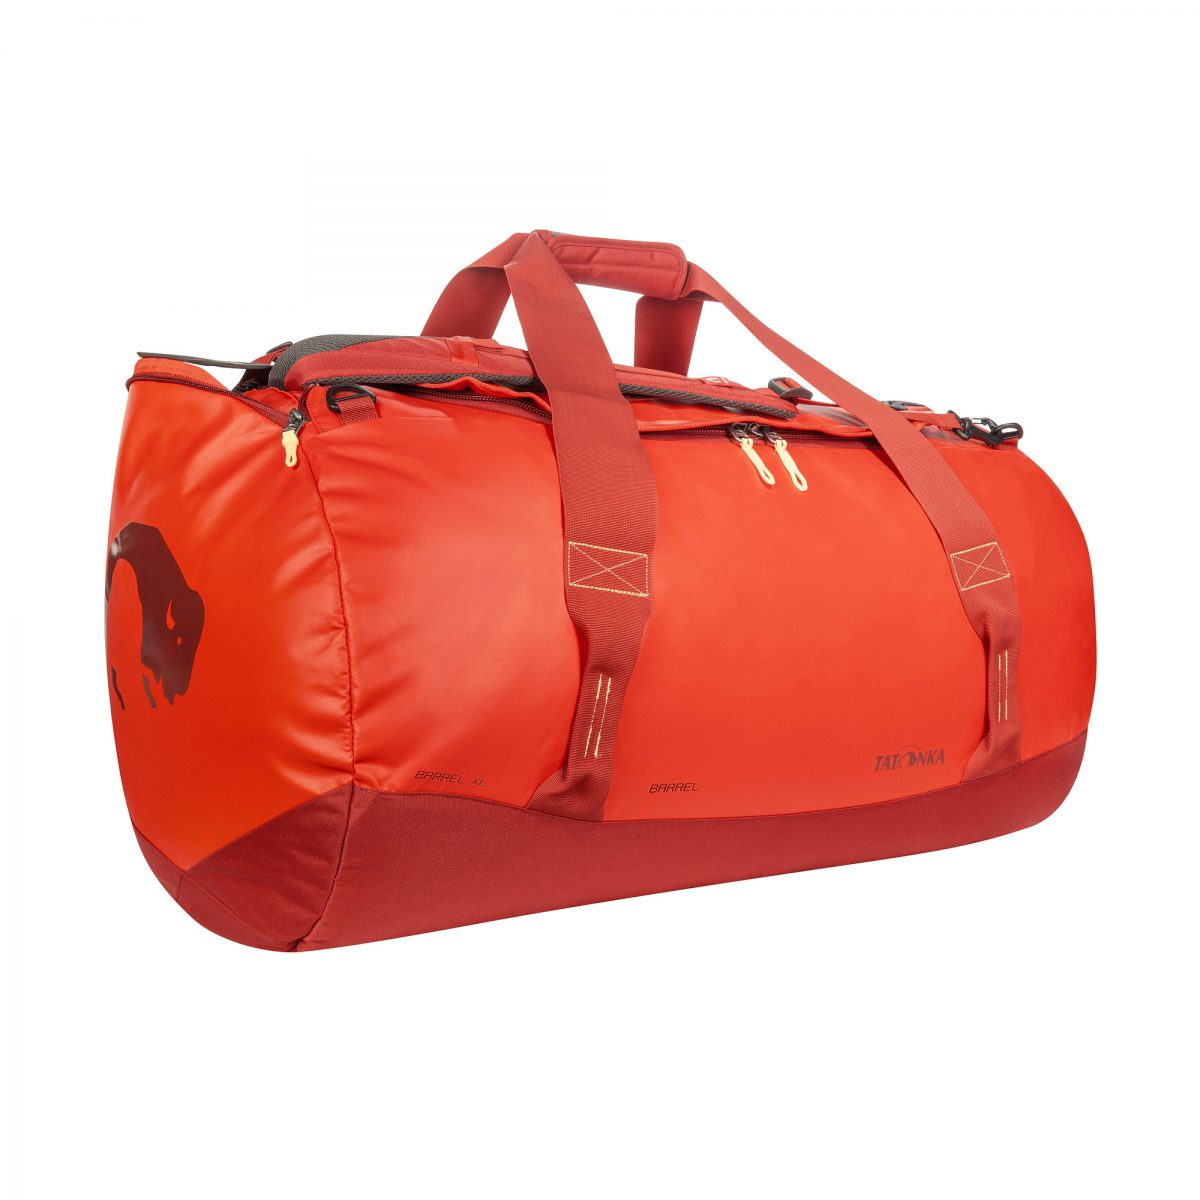 Picture of Tatonka Barrel XL Travel Bag - red orange